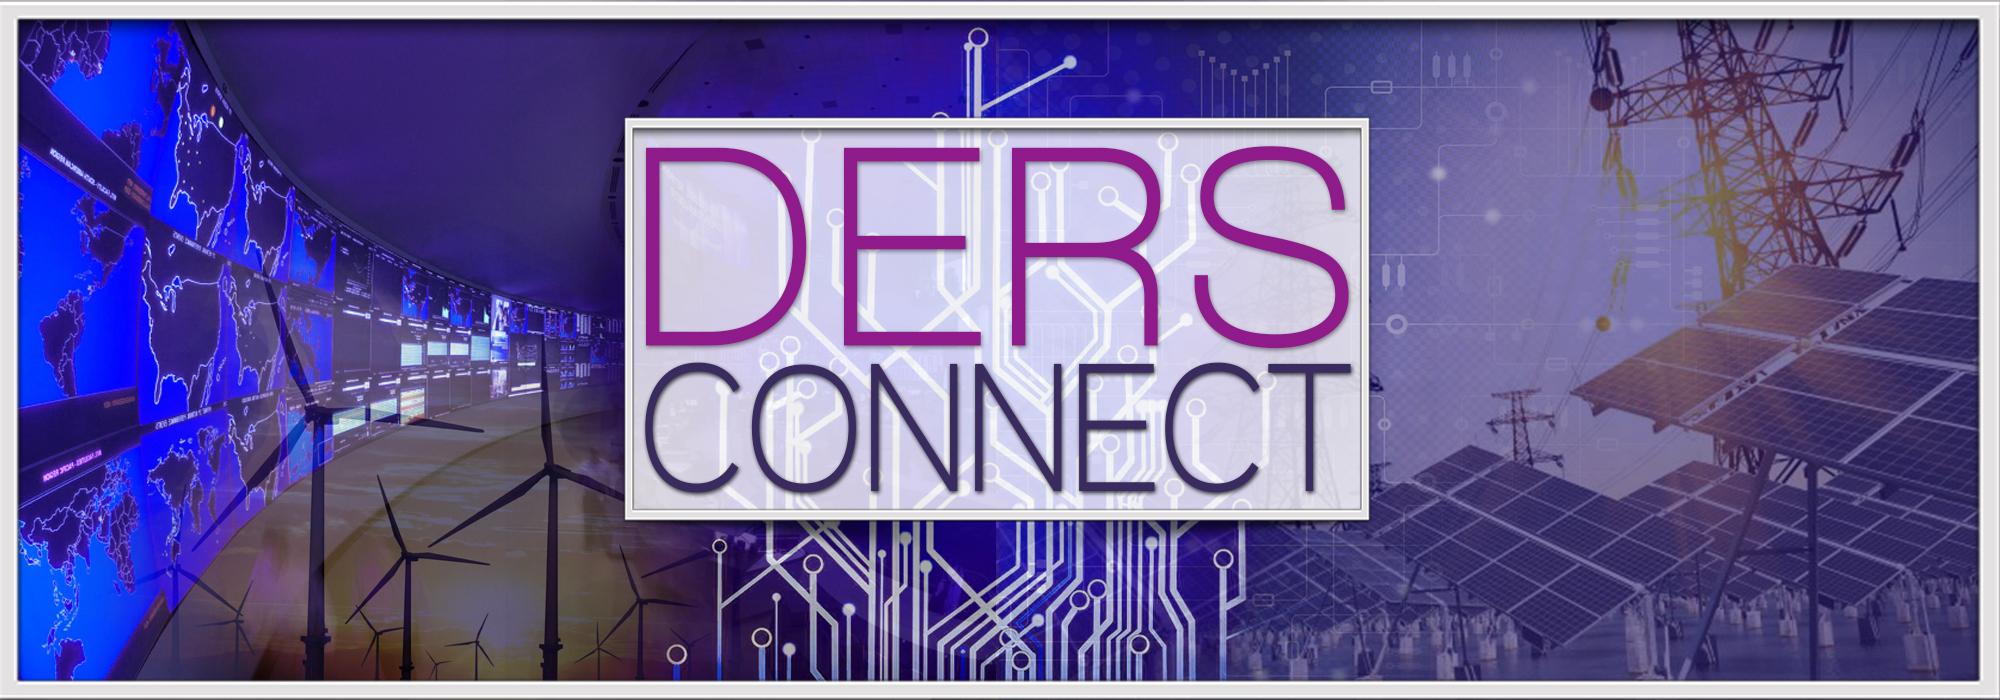 DERS Banner 2020